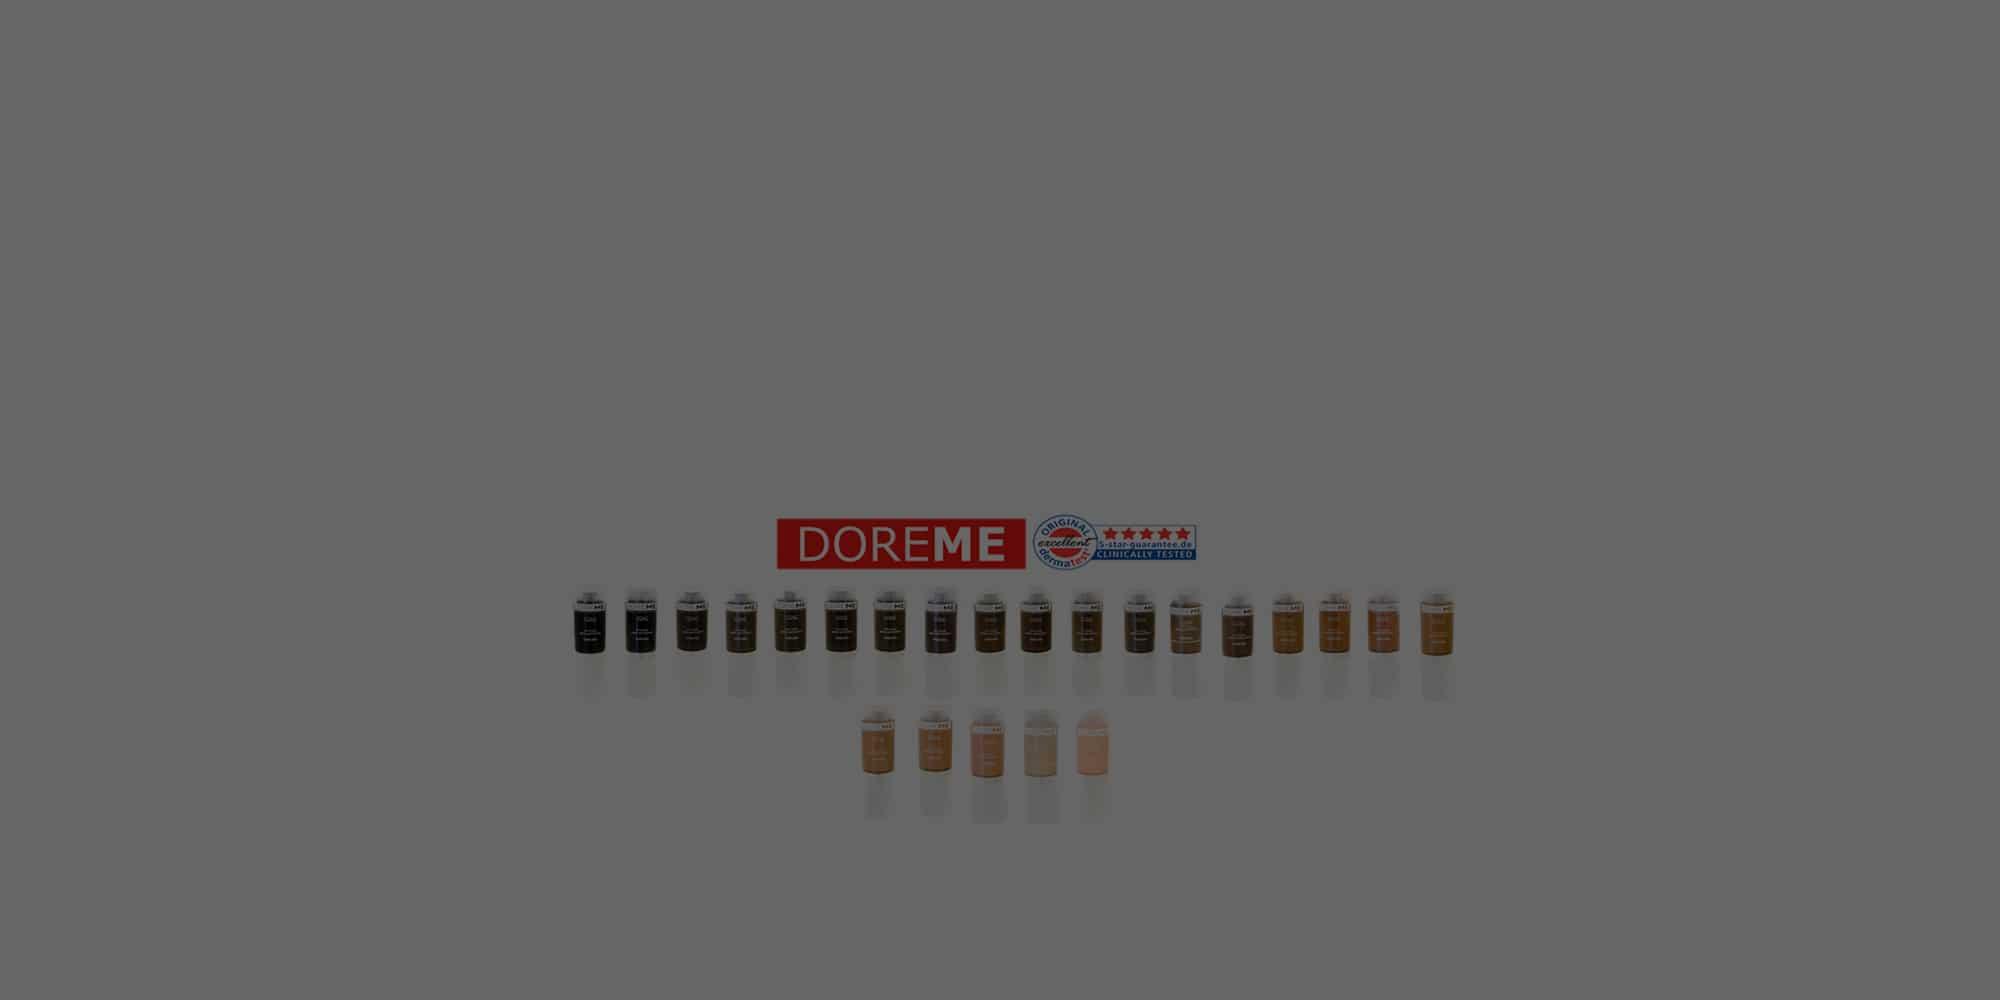 doreme-concentrate-pigment-line